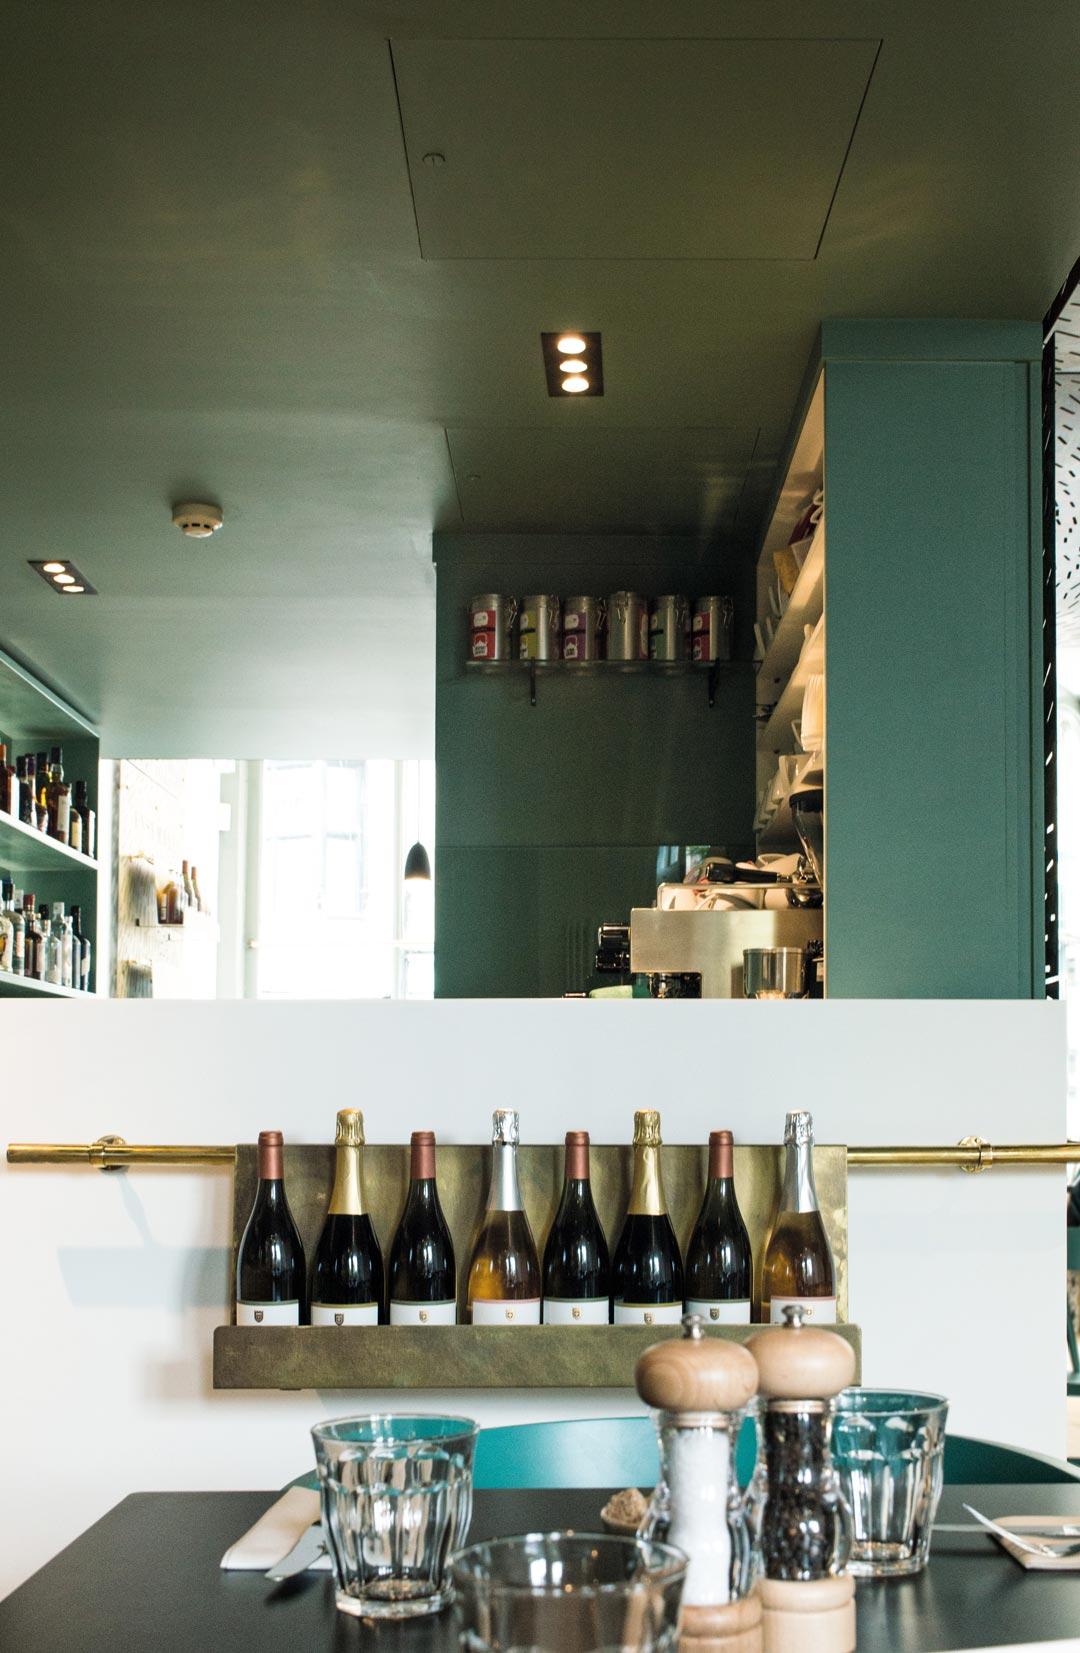 Ensemble Wells Restaurant Shelf Details